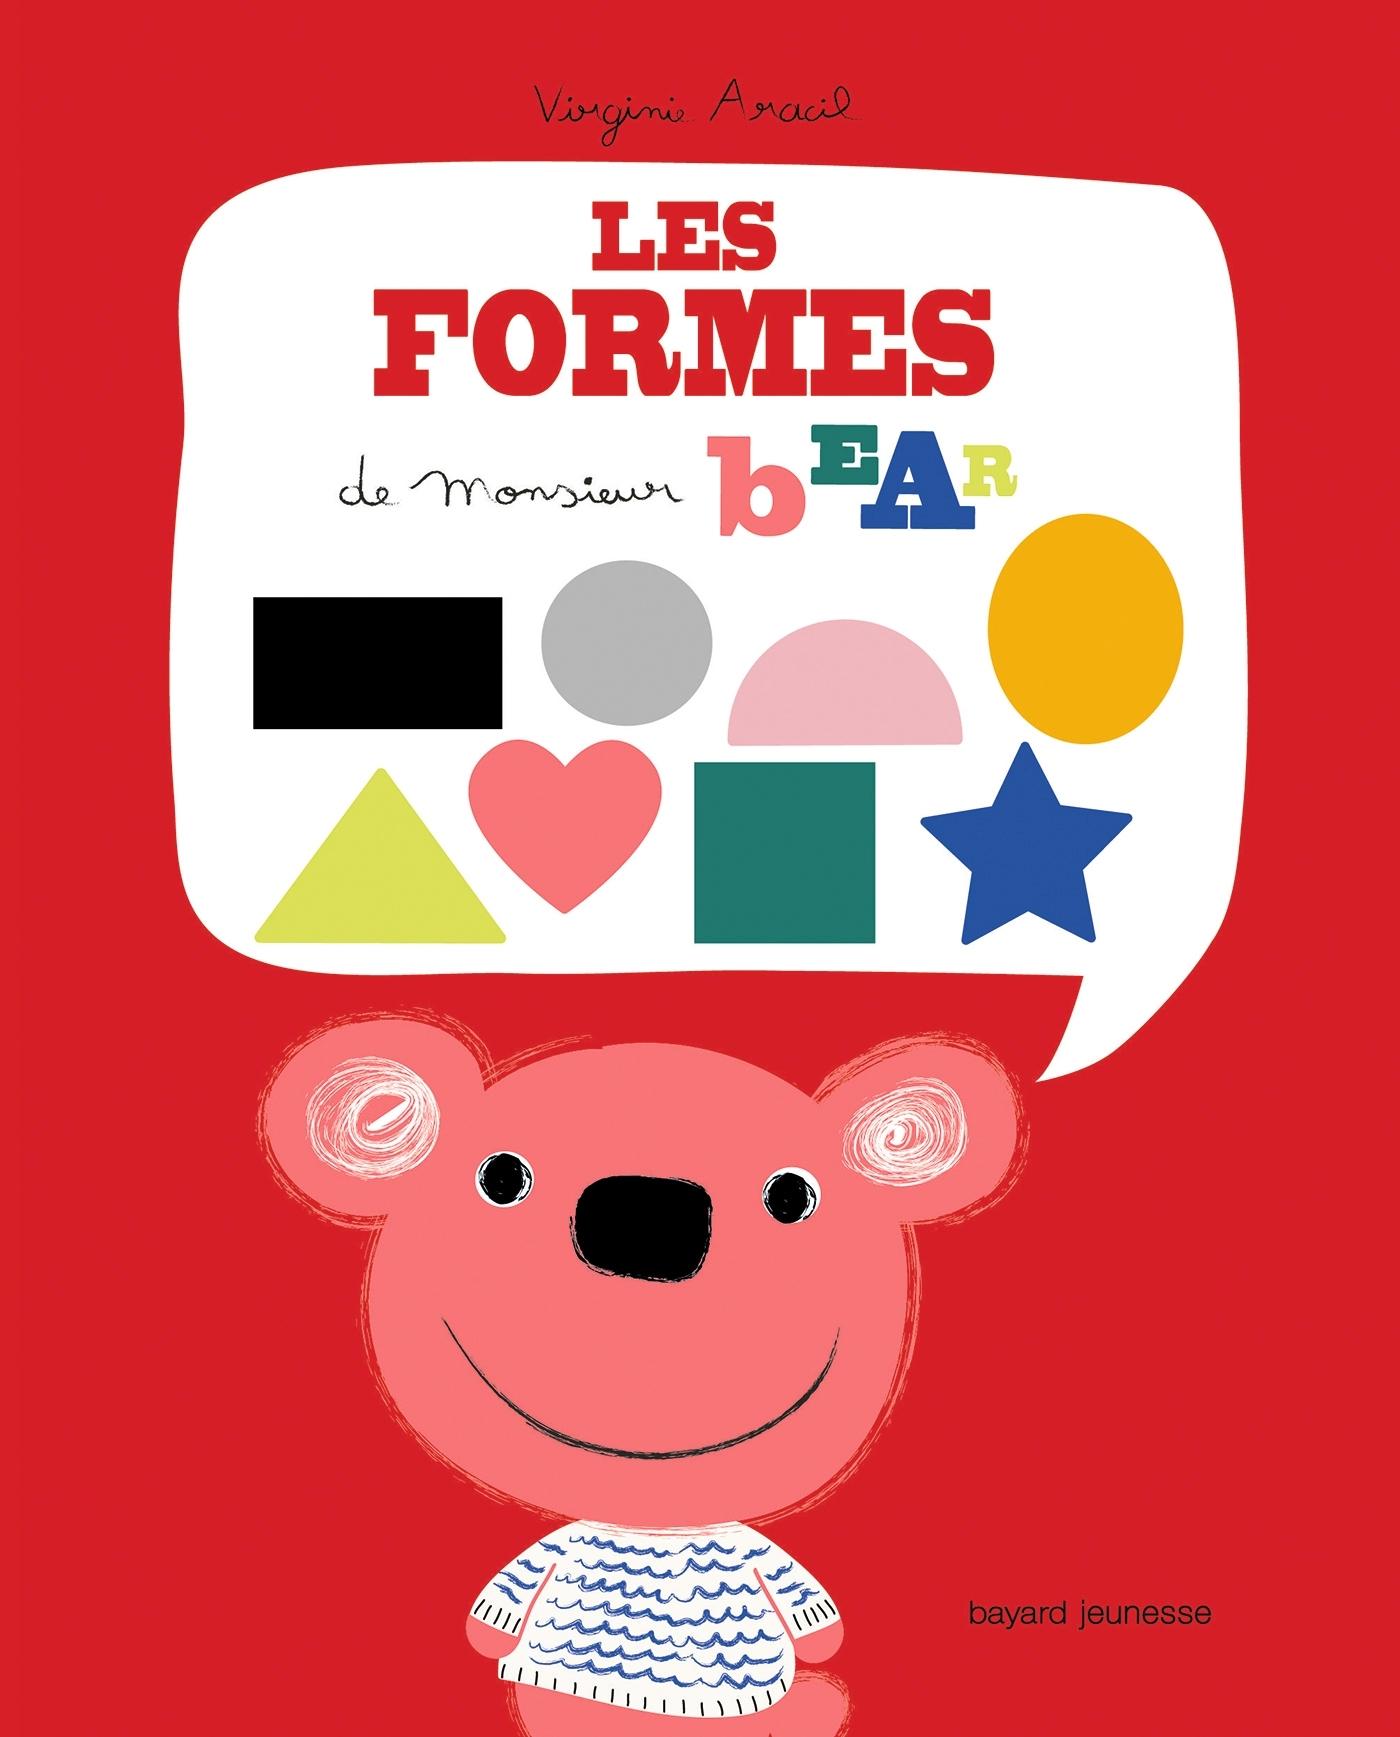 M. BEAR LES FORMES